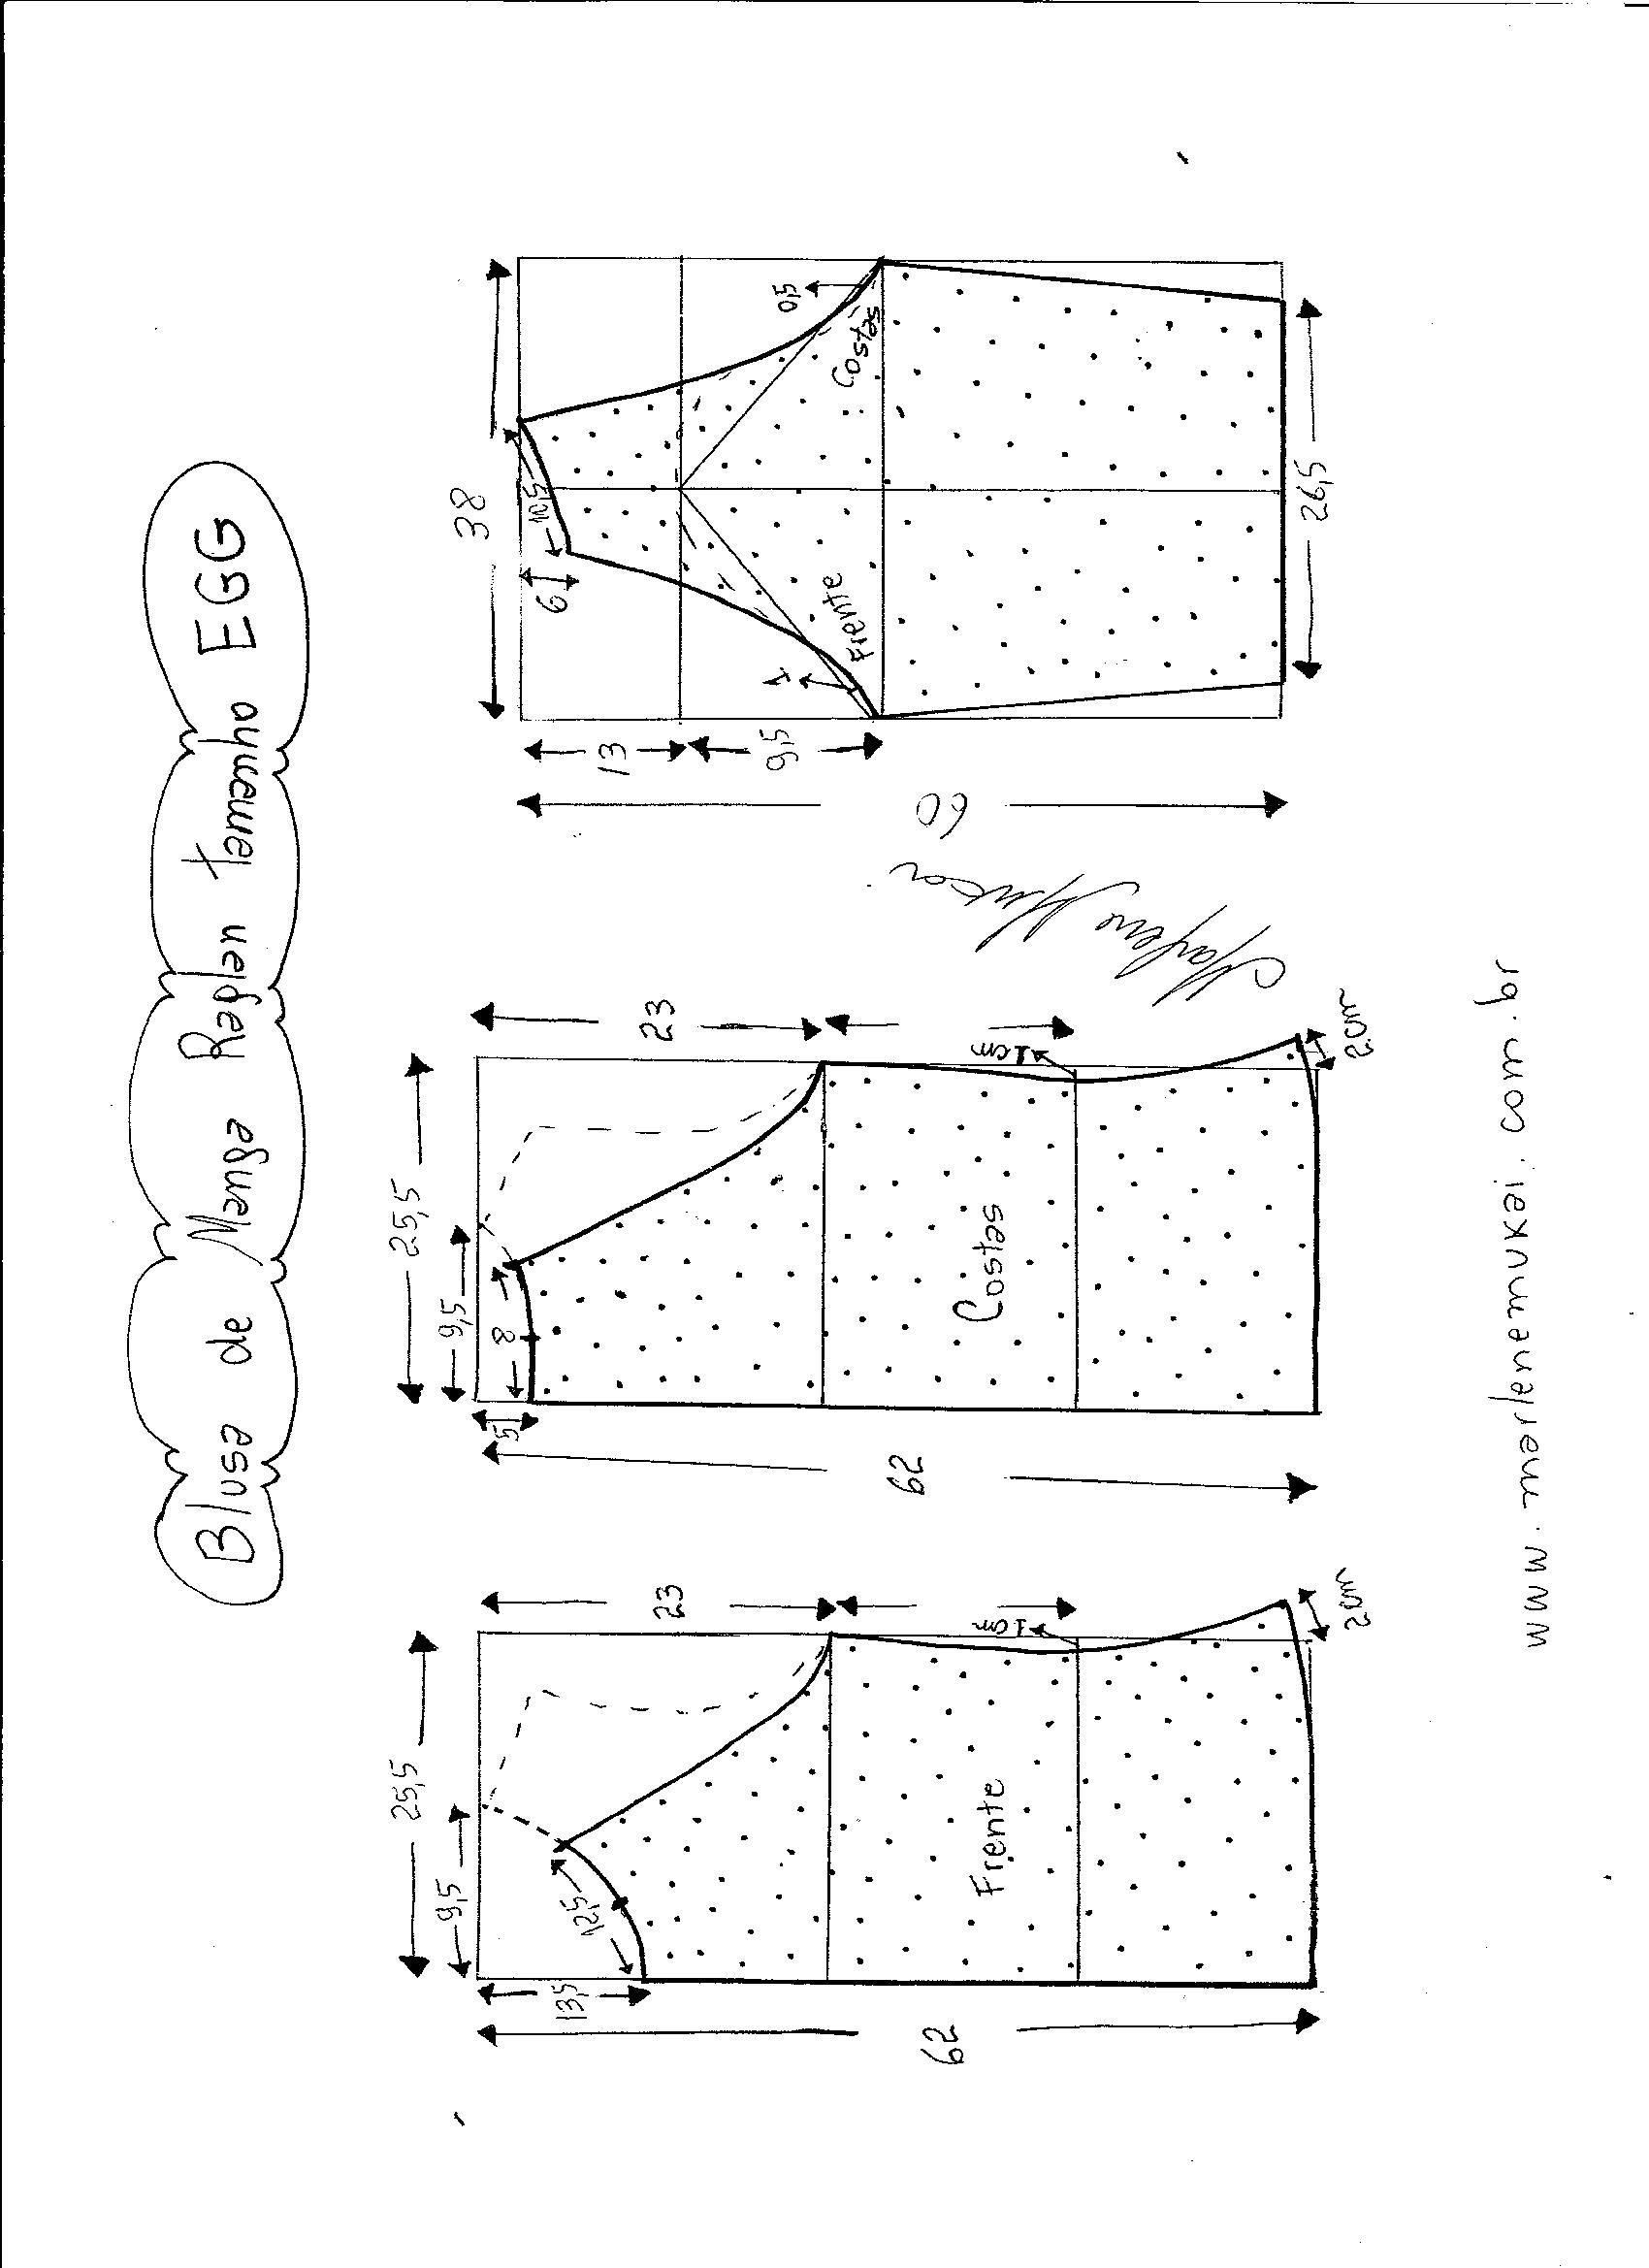 Blusa de malha com manga raglan | Molde, Costura y Patrones